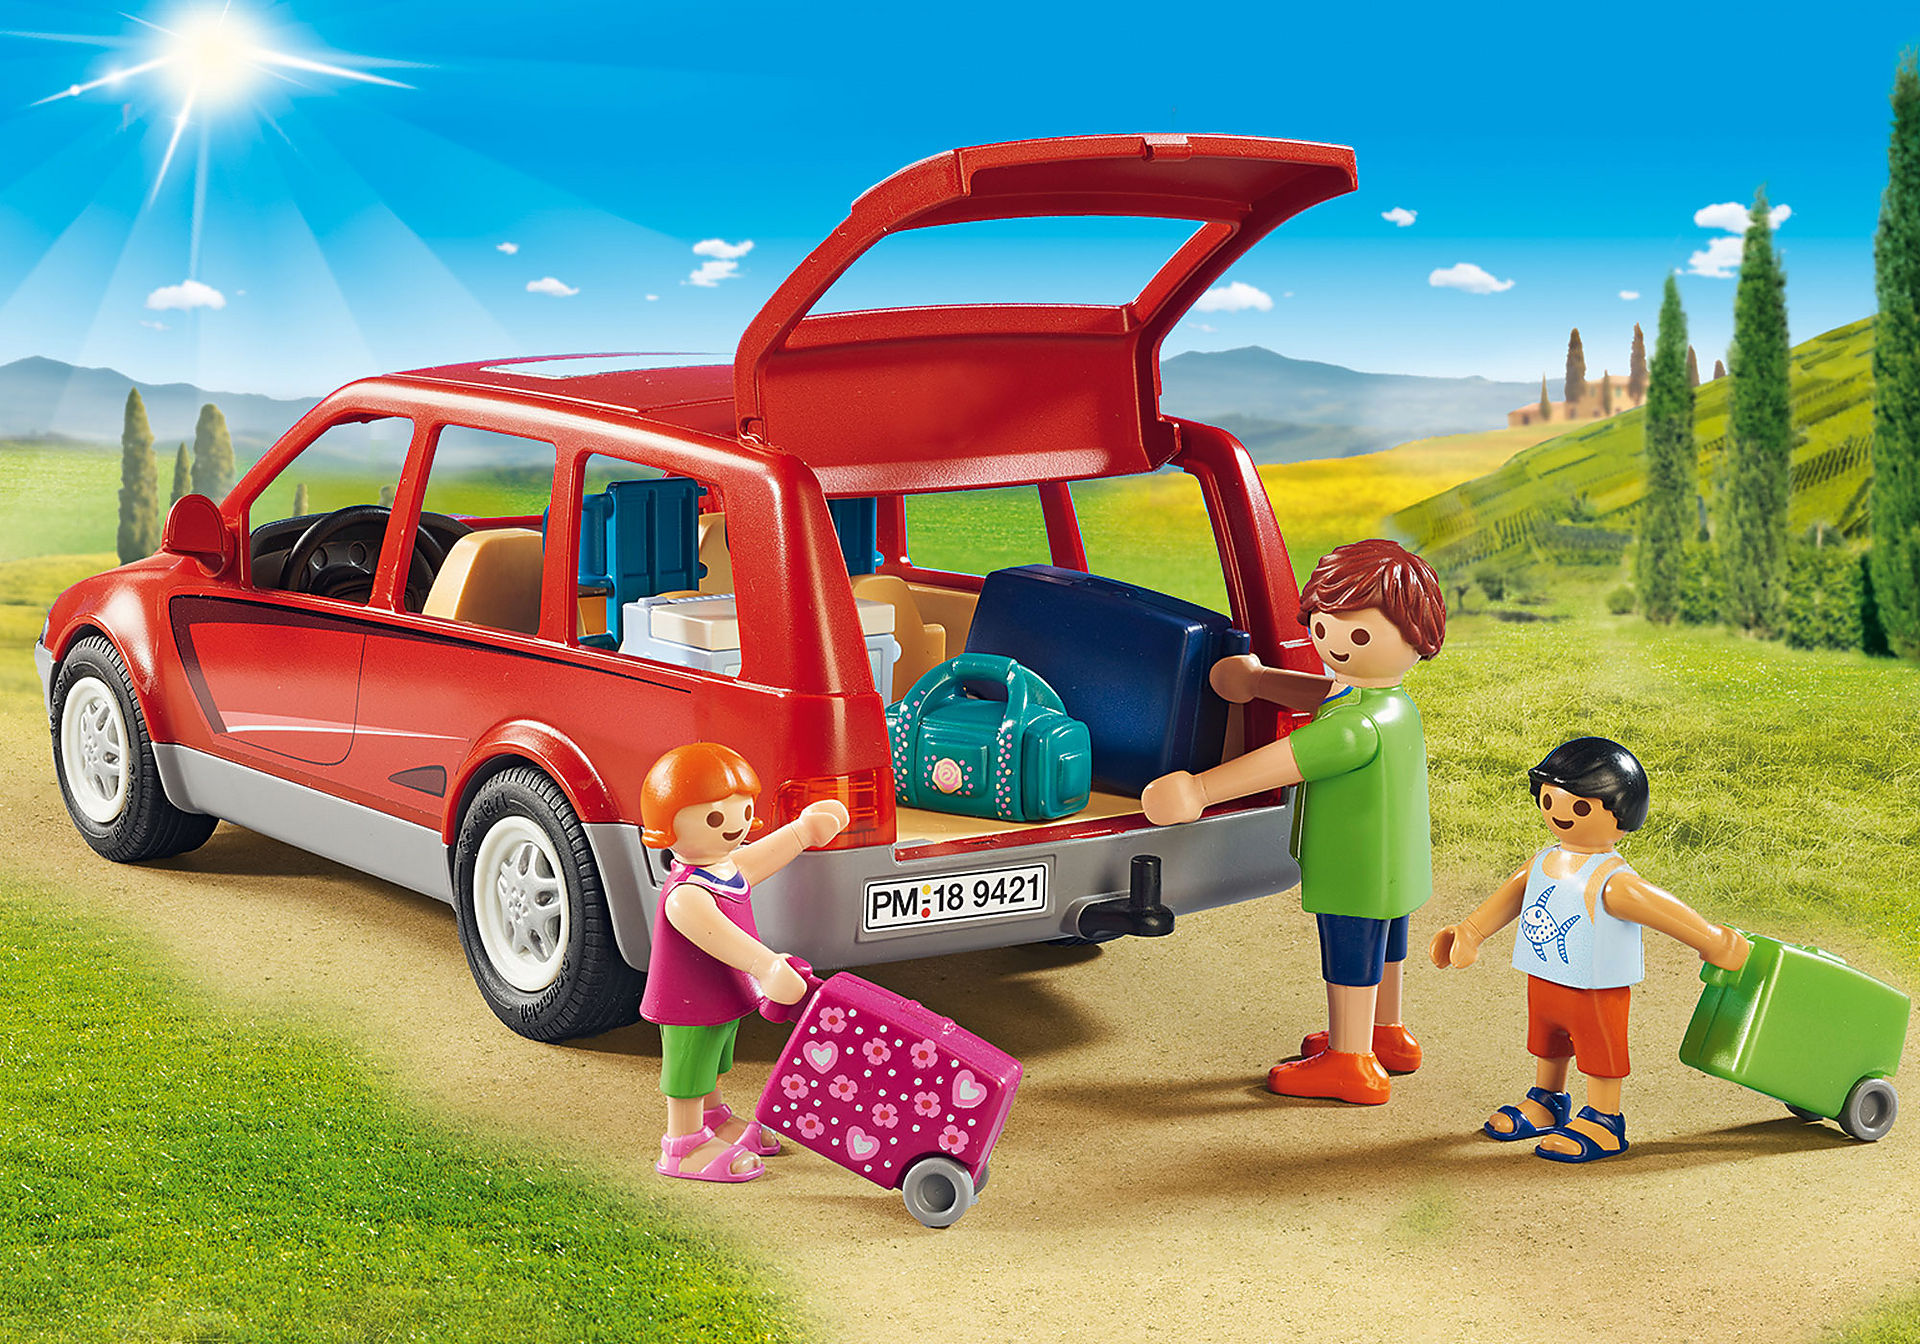 http://media.playmobil.com/i/playmobil/9421_product_extra1/Coche Familiar